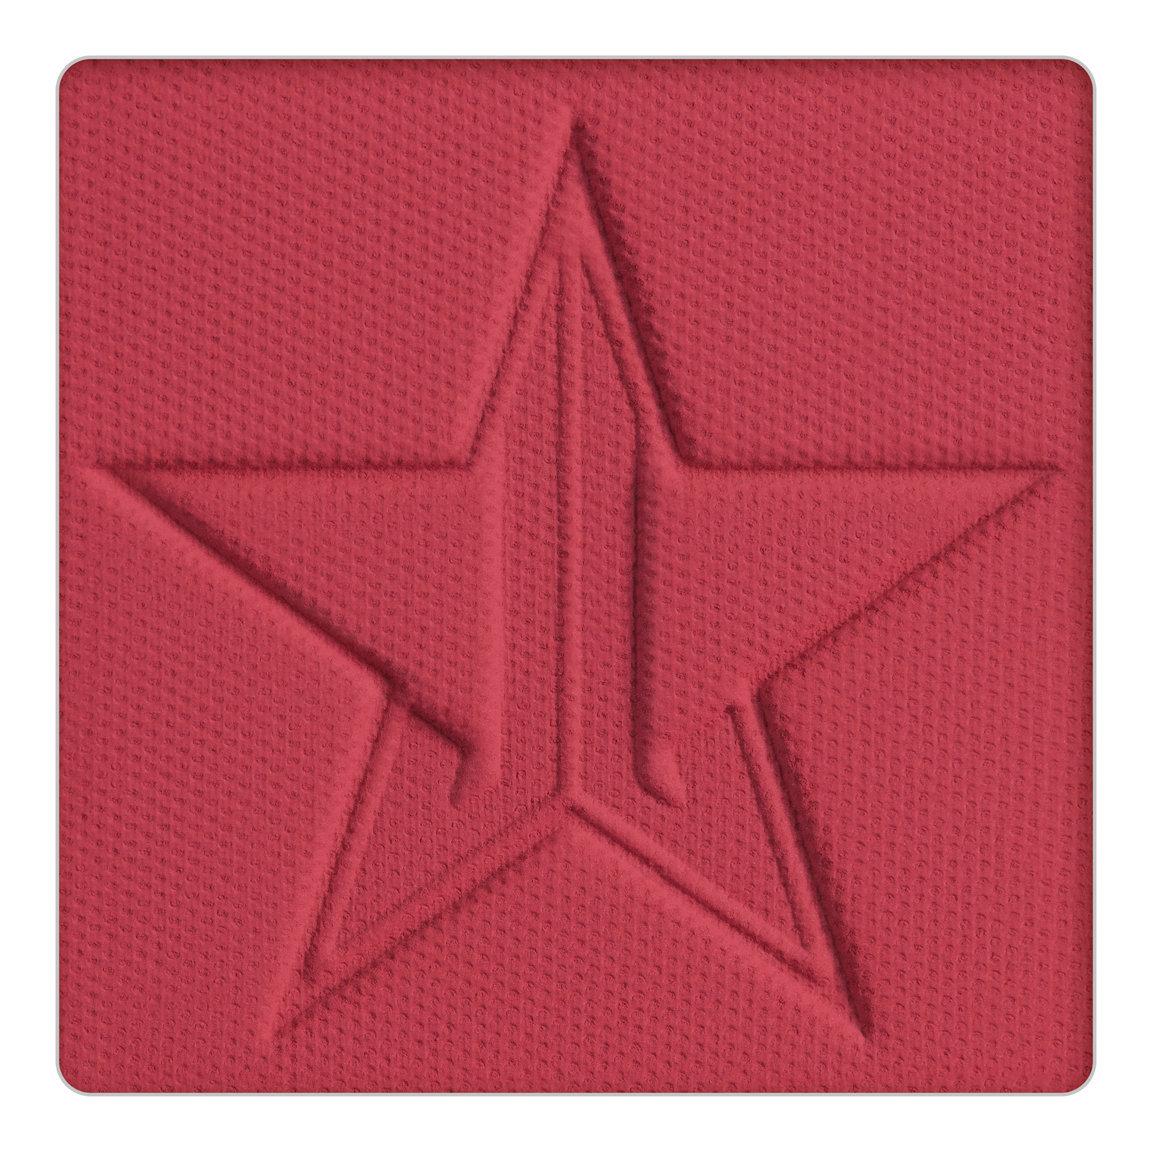 Jeffree Star Cosmetics Artistry Singles Cherry Soda alternative view 1.